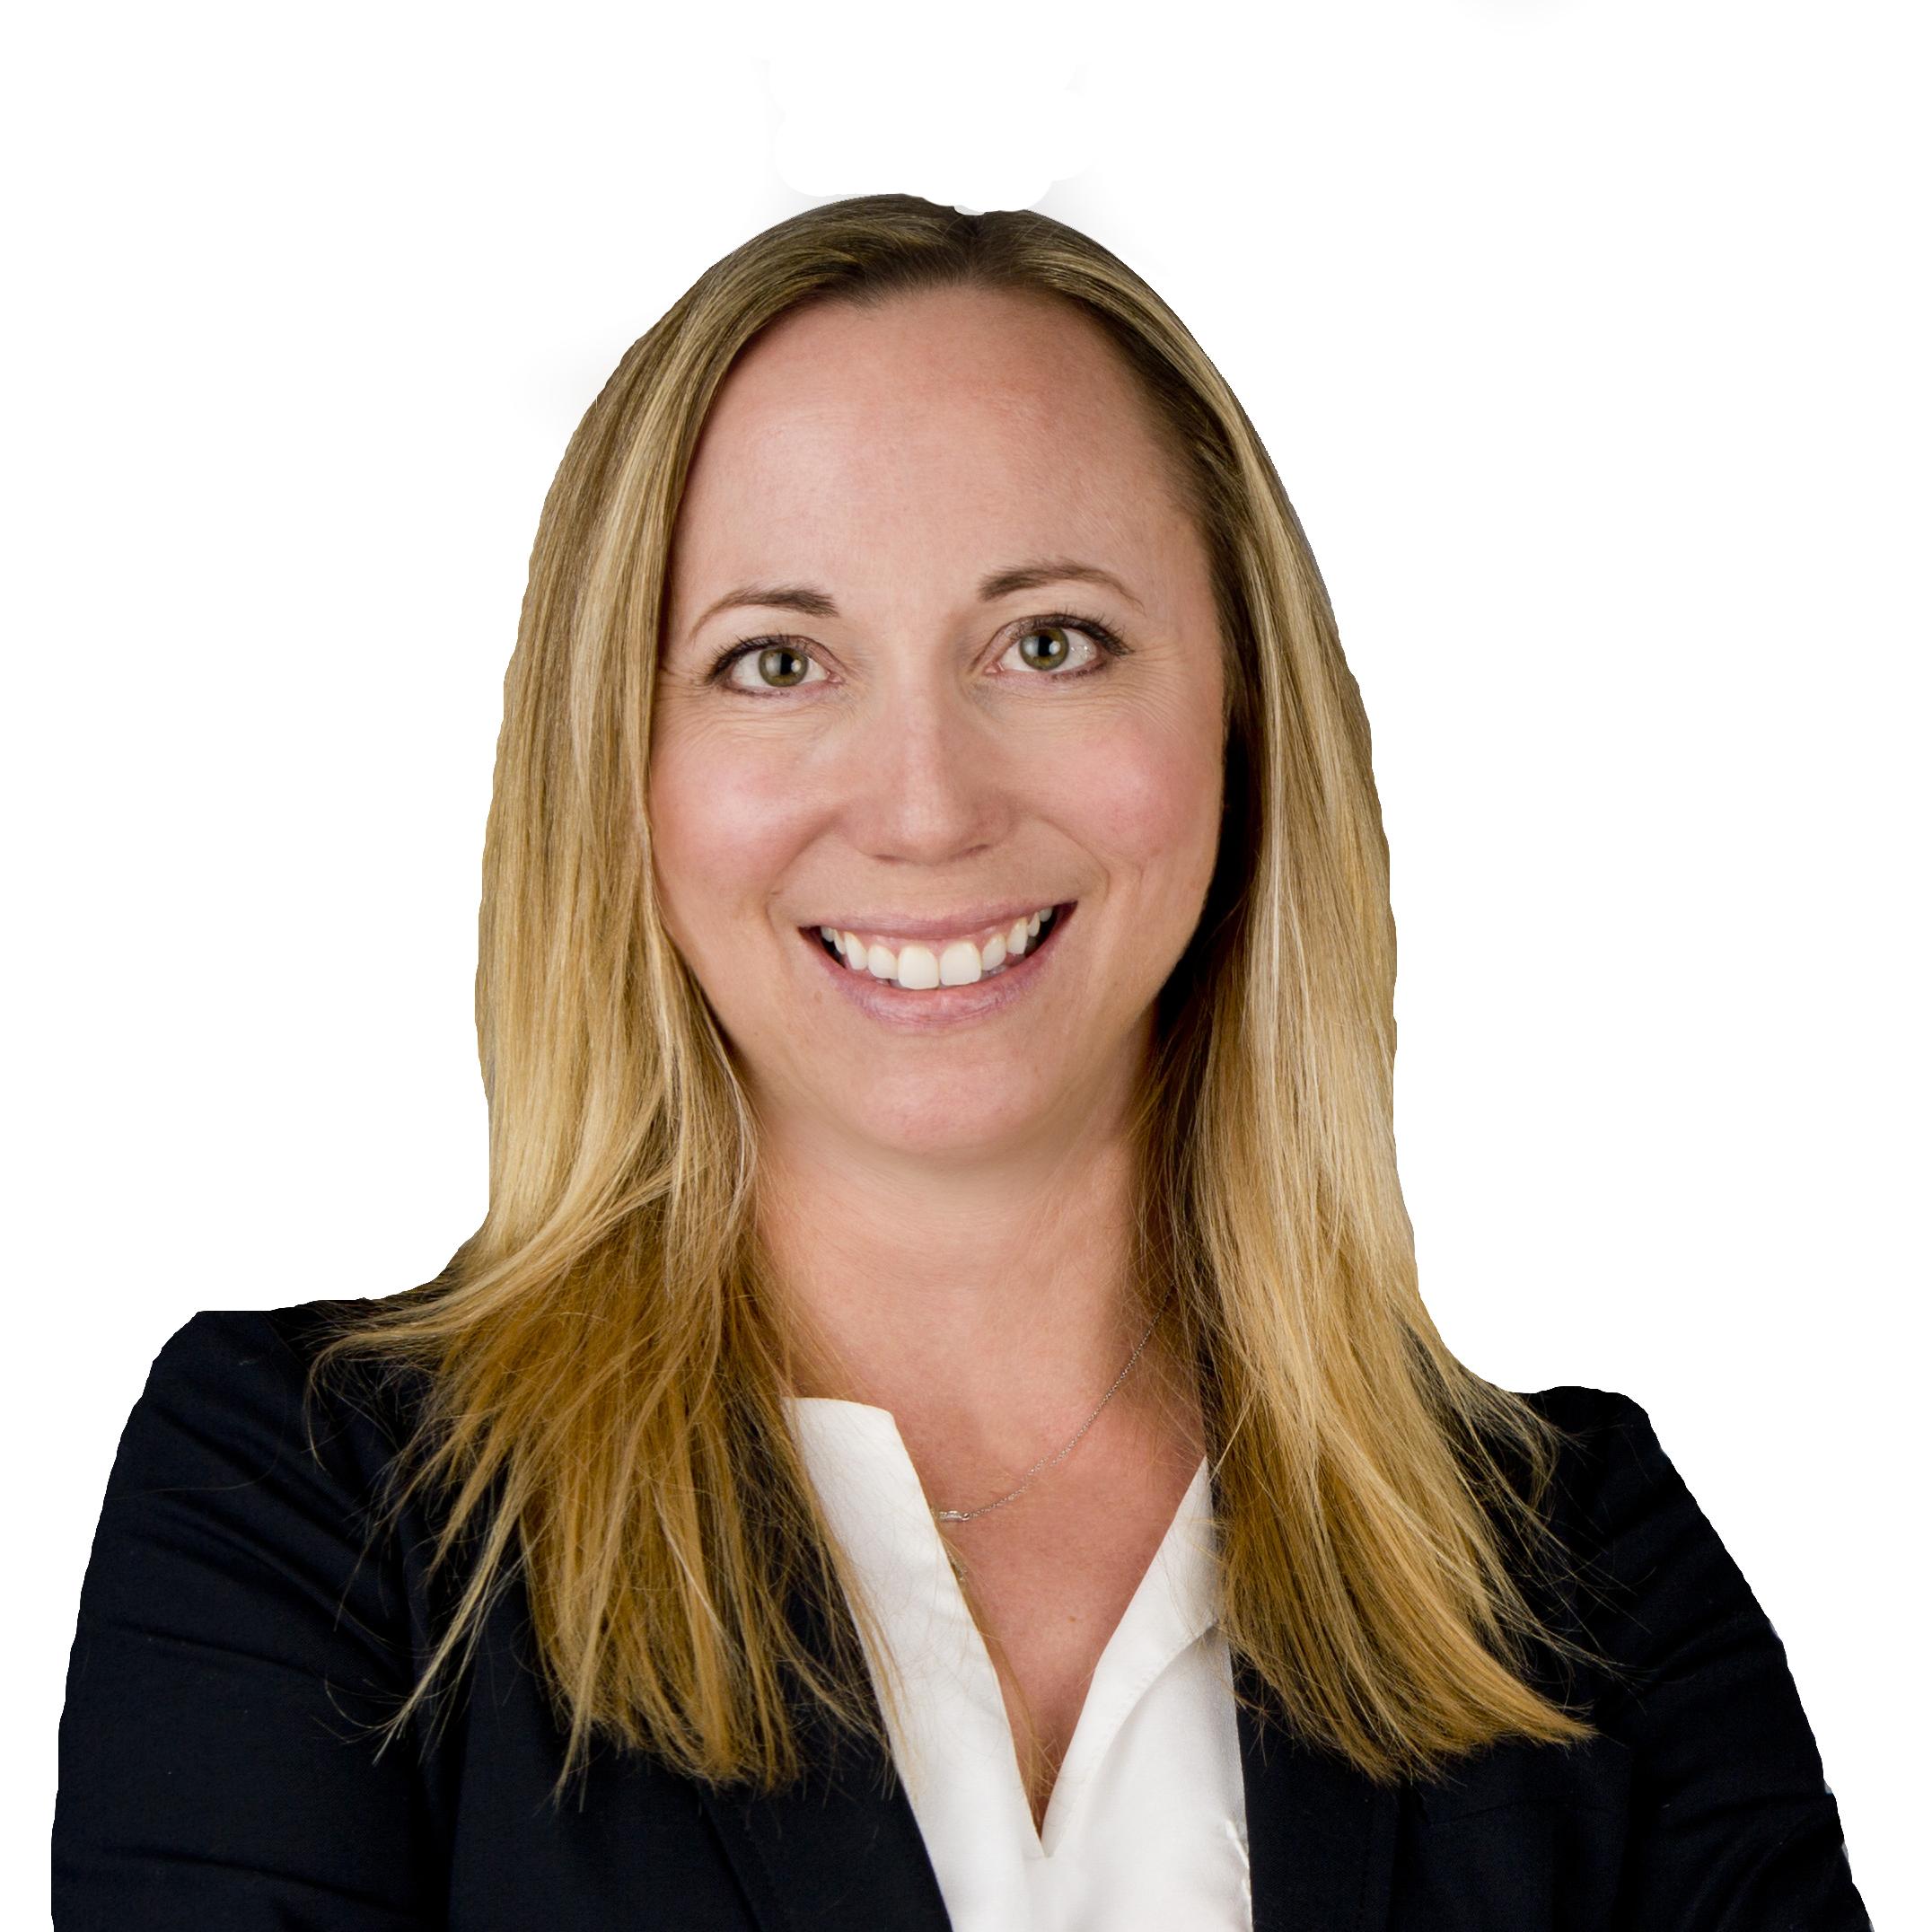 Sarah Stogner